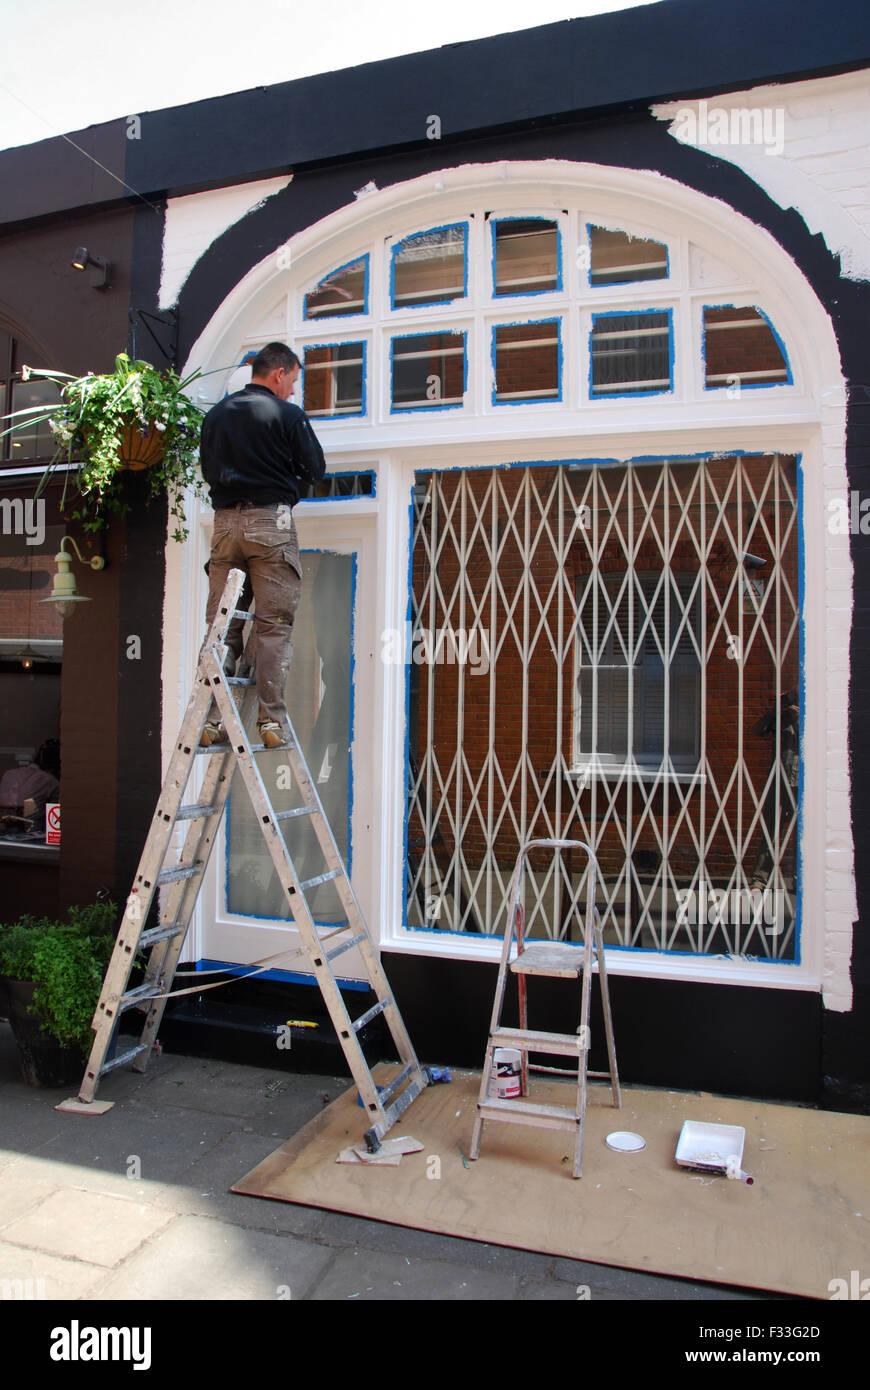 Maler Malerarbeiten Fassade Eines Hauses Hampstead London Uk